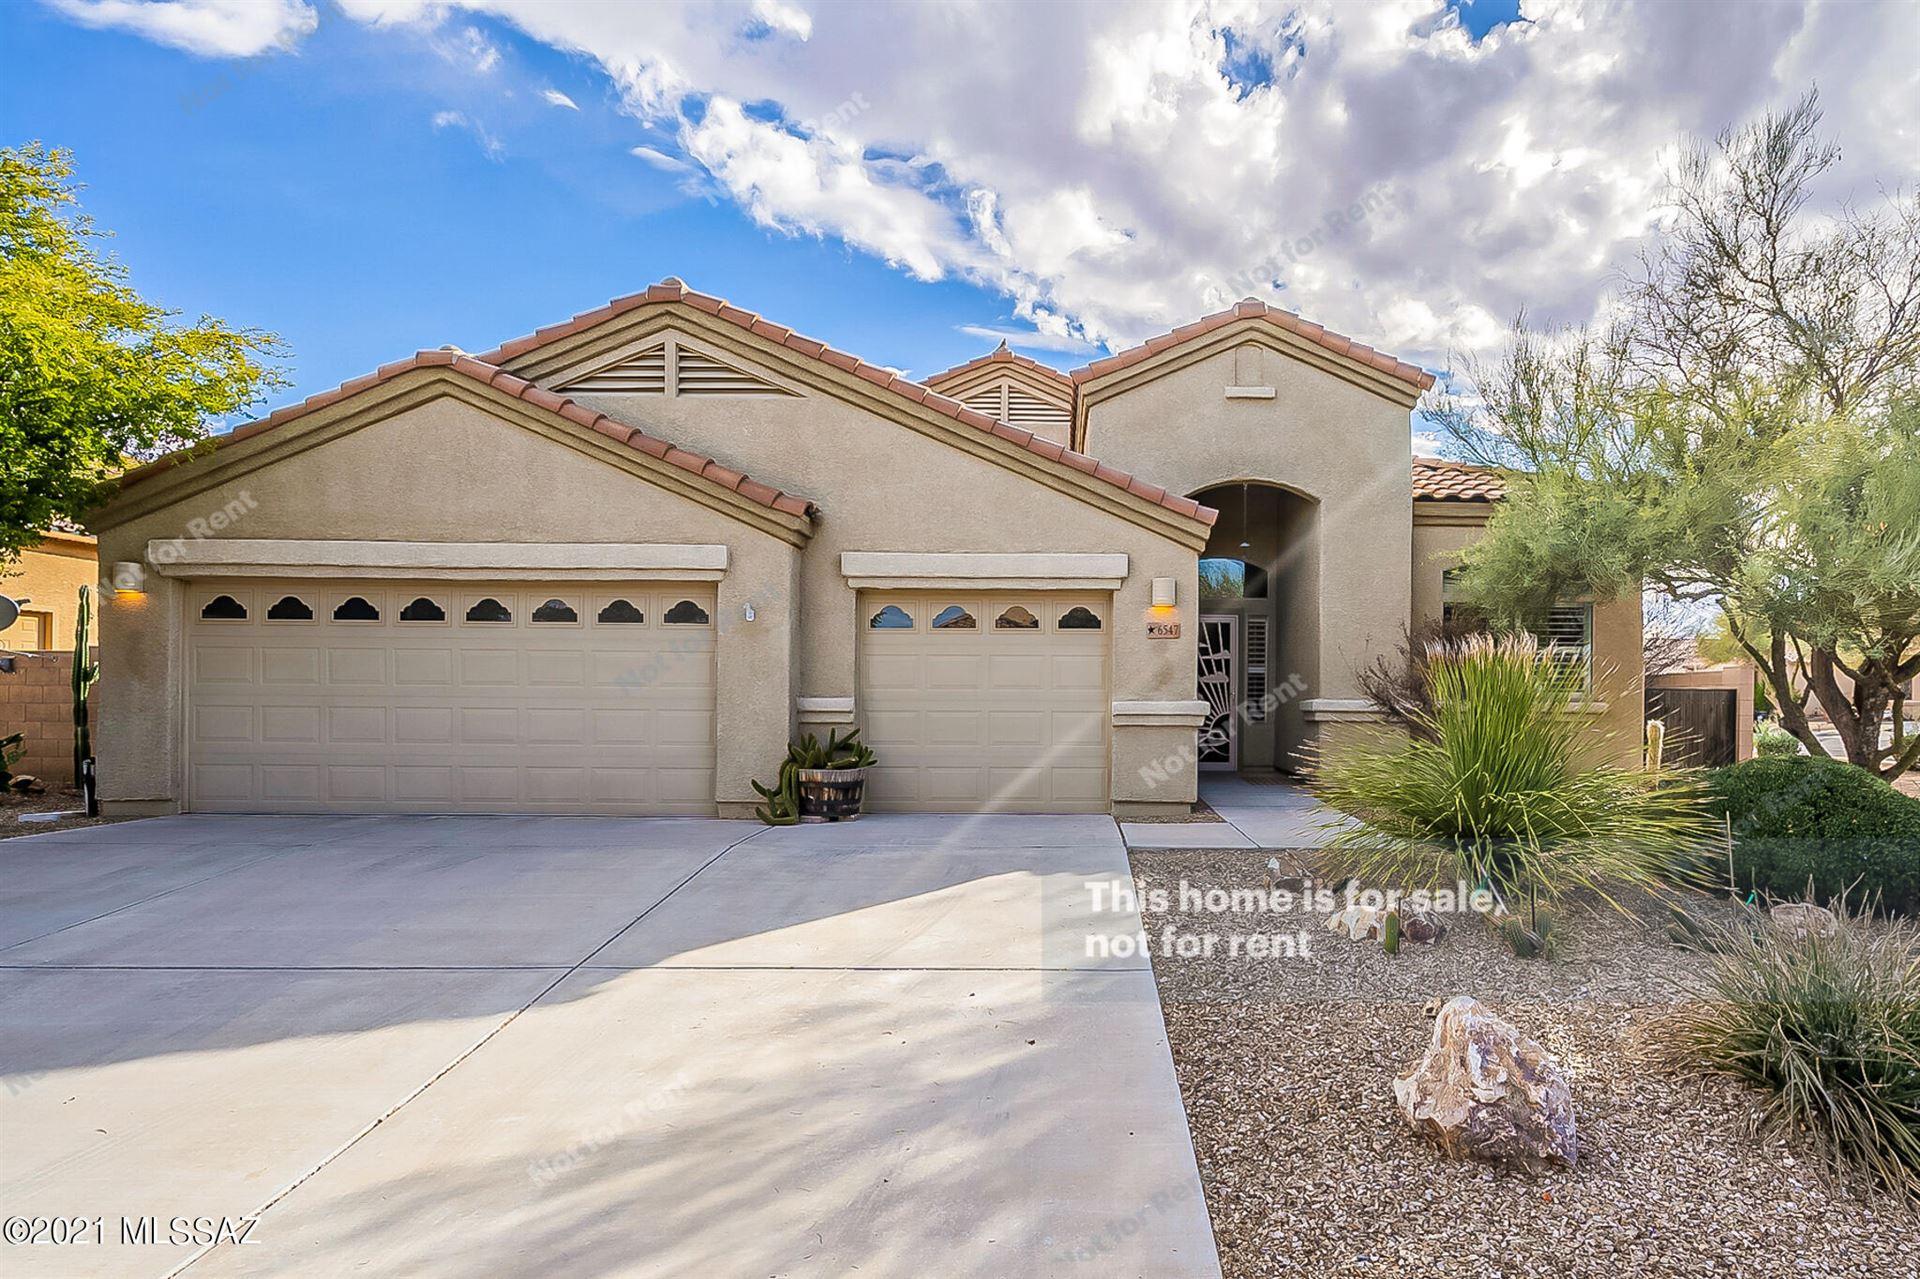 6547 W Castle Pines Way, Tucson, AZ 85757 - MLS#: 22103940